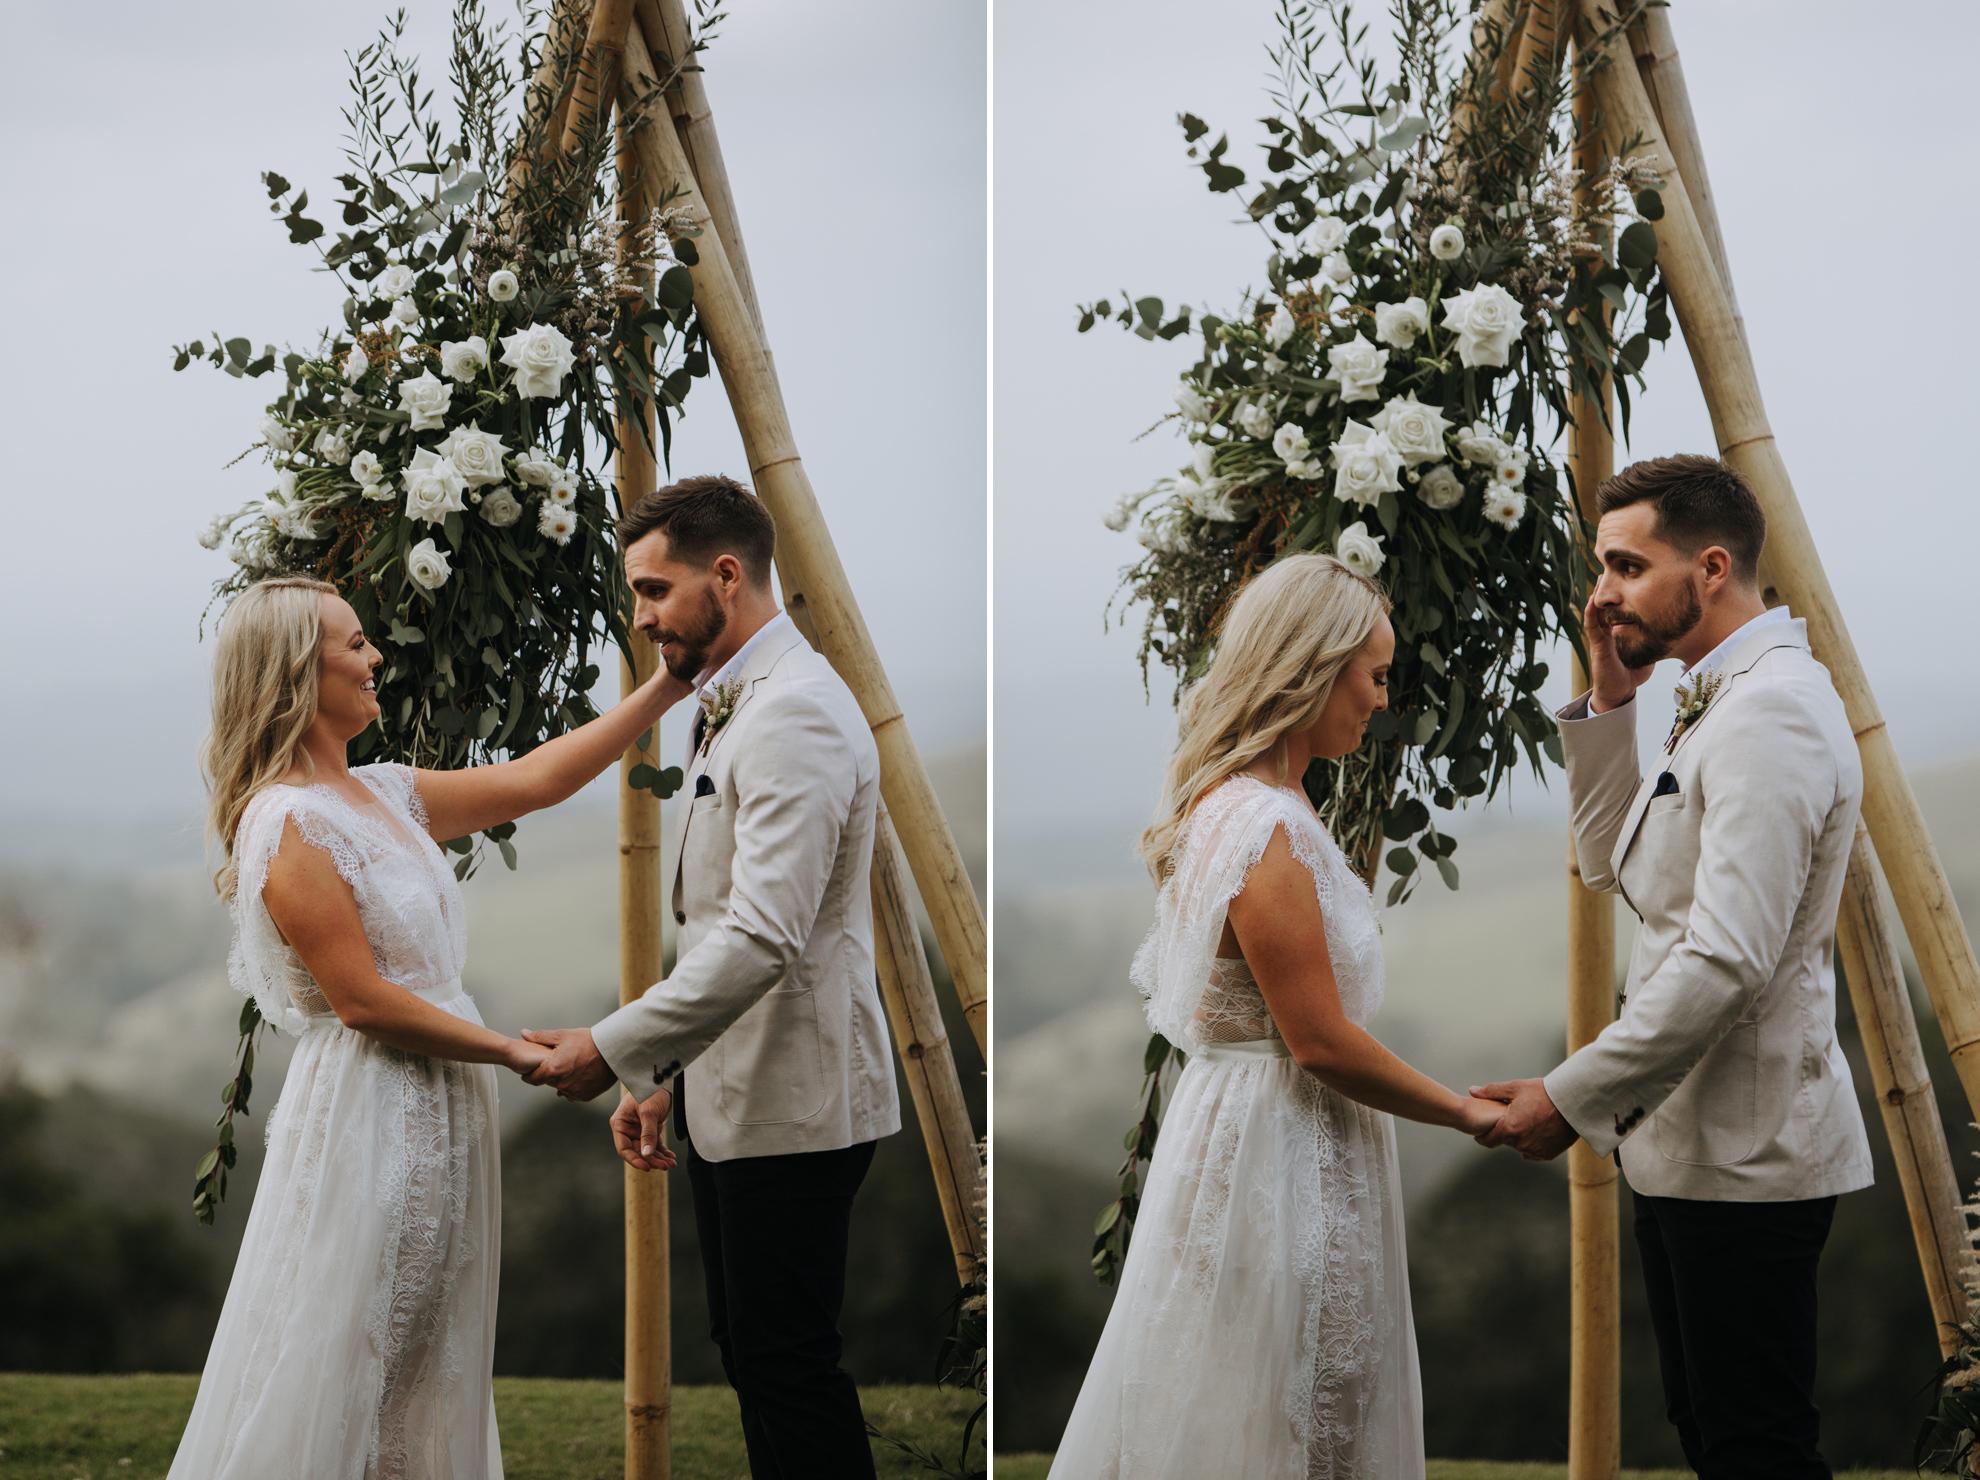 043-Kirby_Lewis_Maleny_Manor_Wedding.jpg